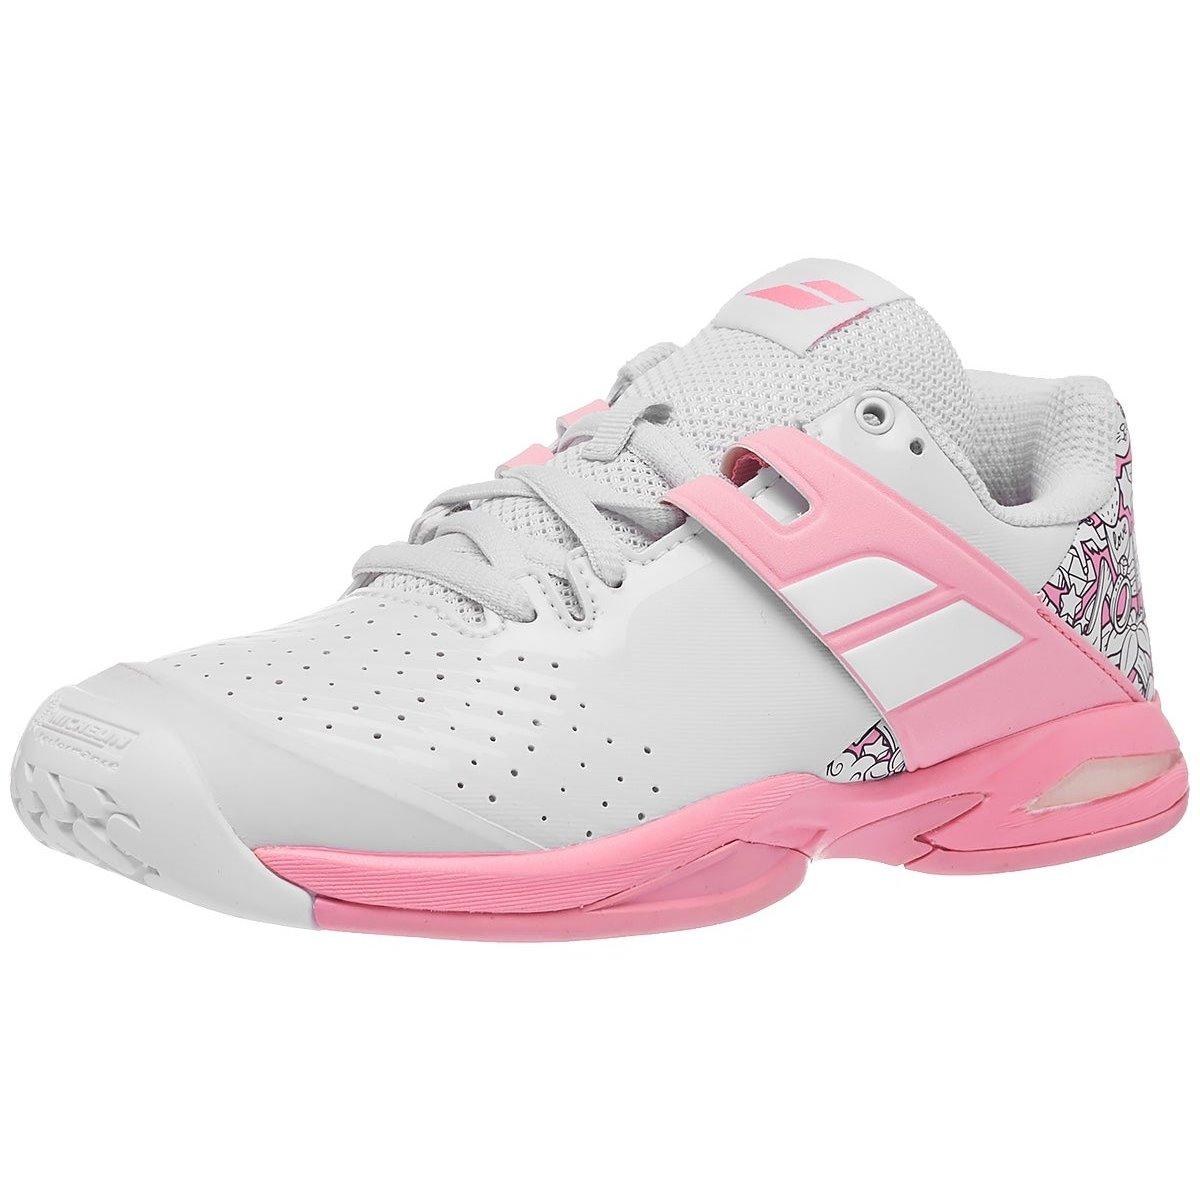 Babolat Propulse AC White/Pink Junior Shoes